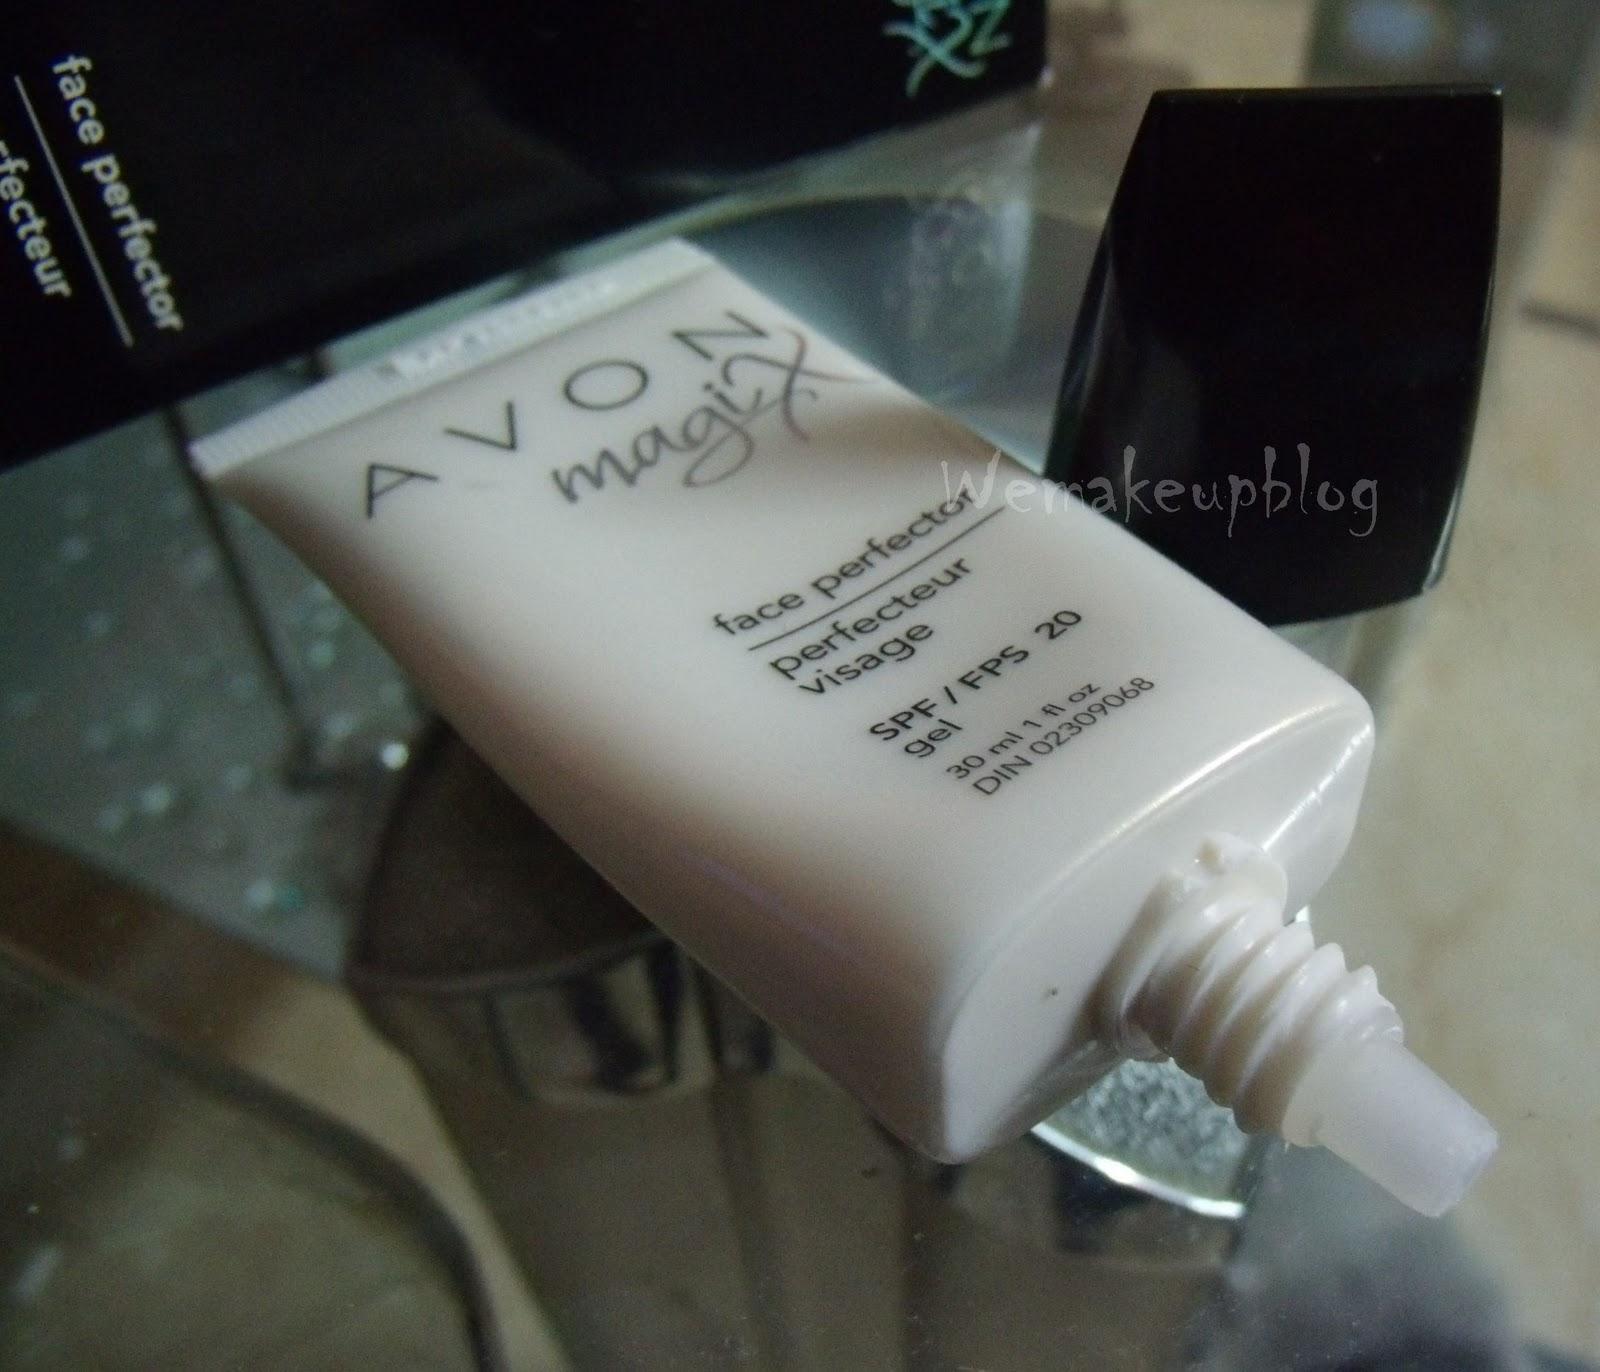 Alkazam Avon MagiX Face Perfector SPF Gel